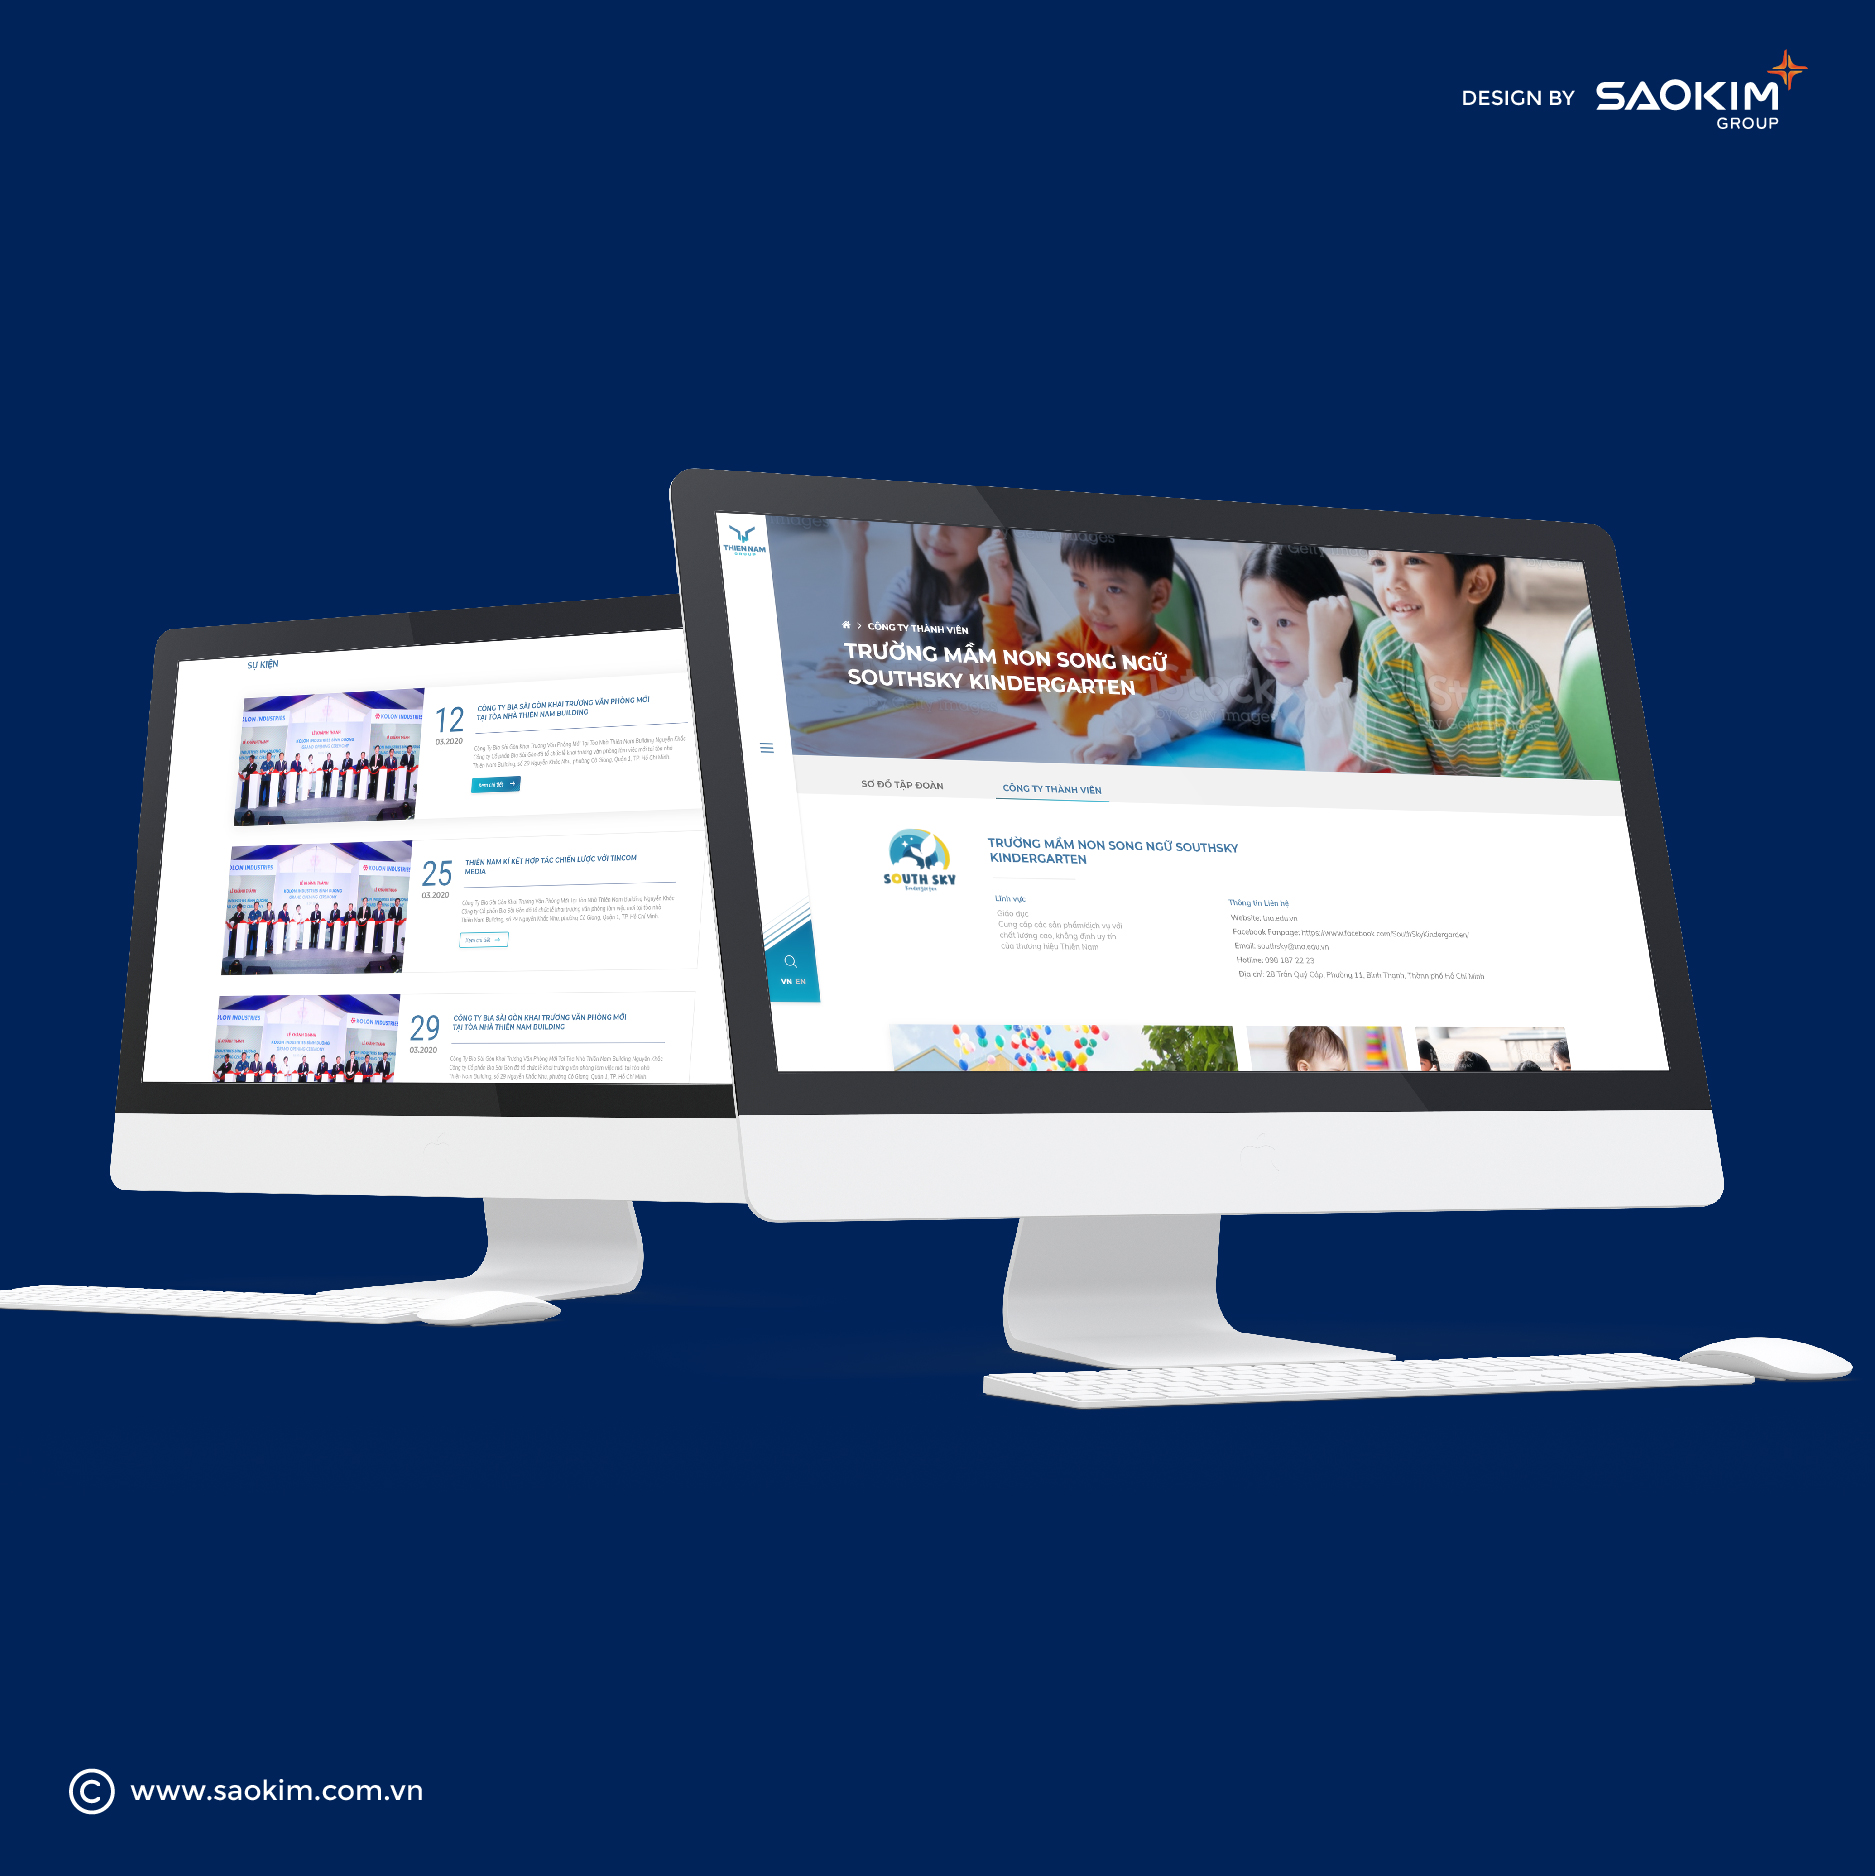 Design Website and Brand Identity Thien Nam tại TP HCM